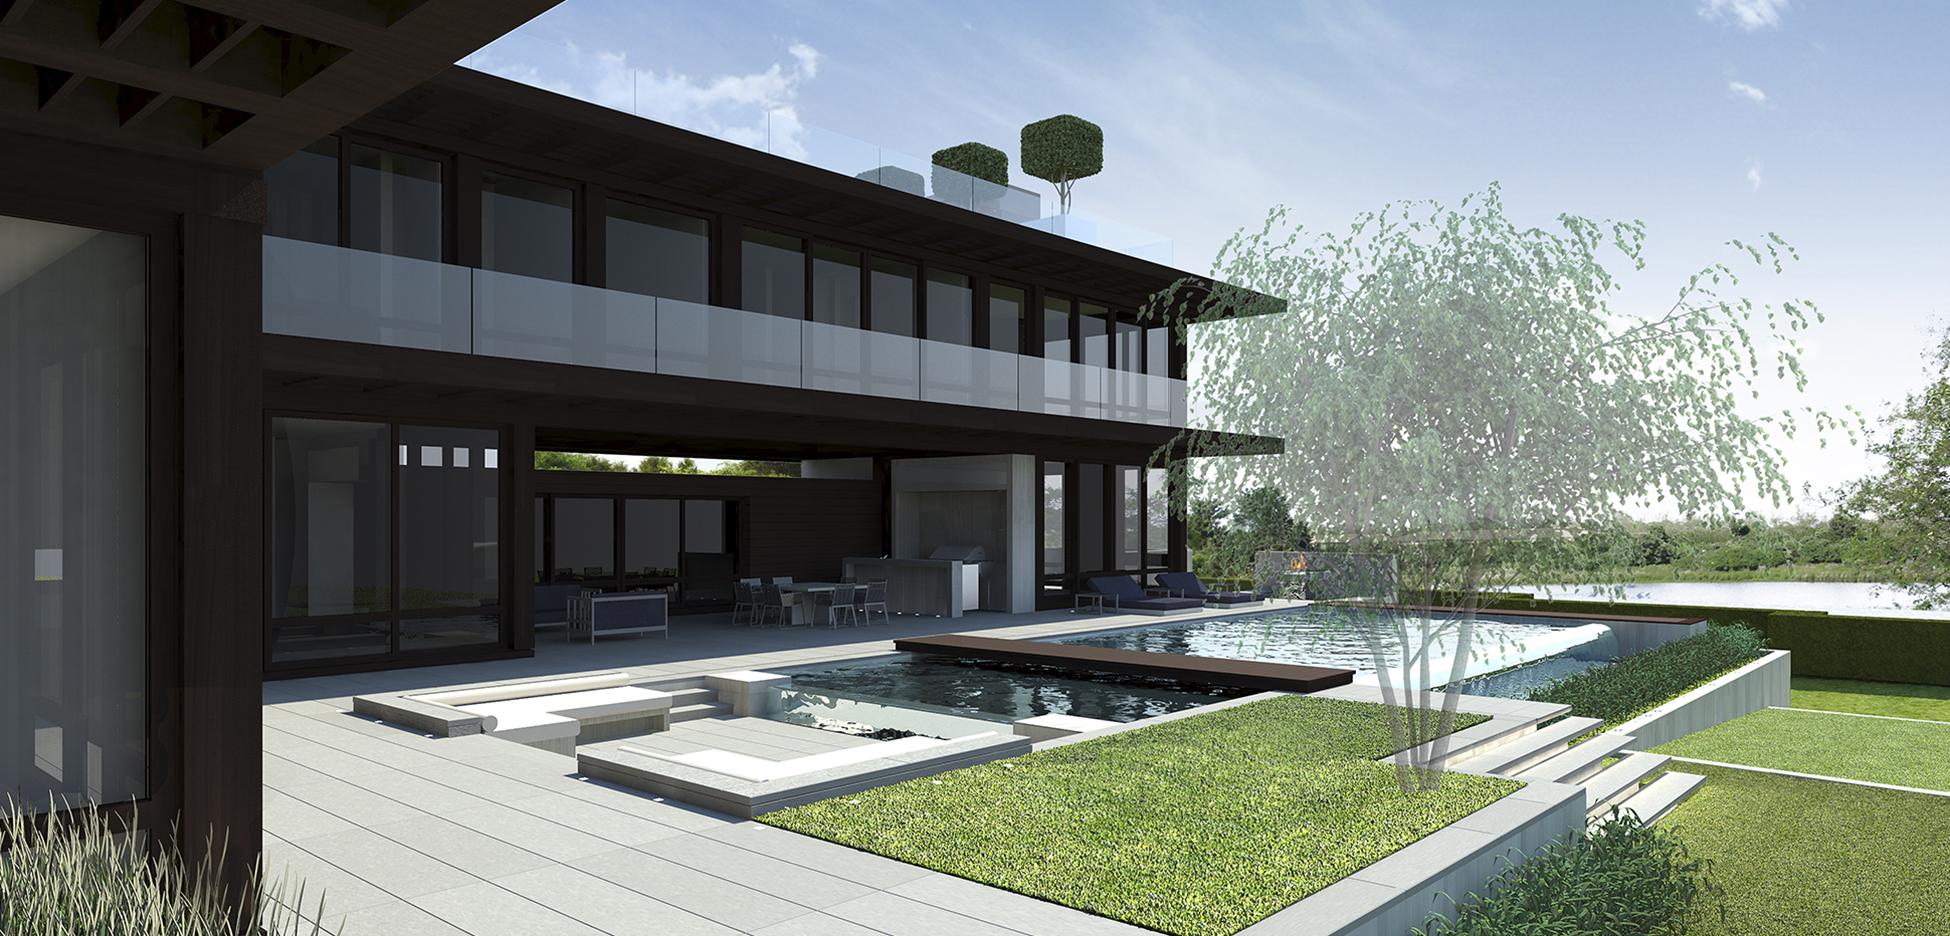 1 Brian-OKeefe-Architect-Sagaponack-Exterior